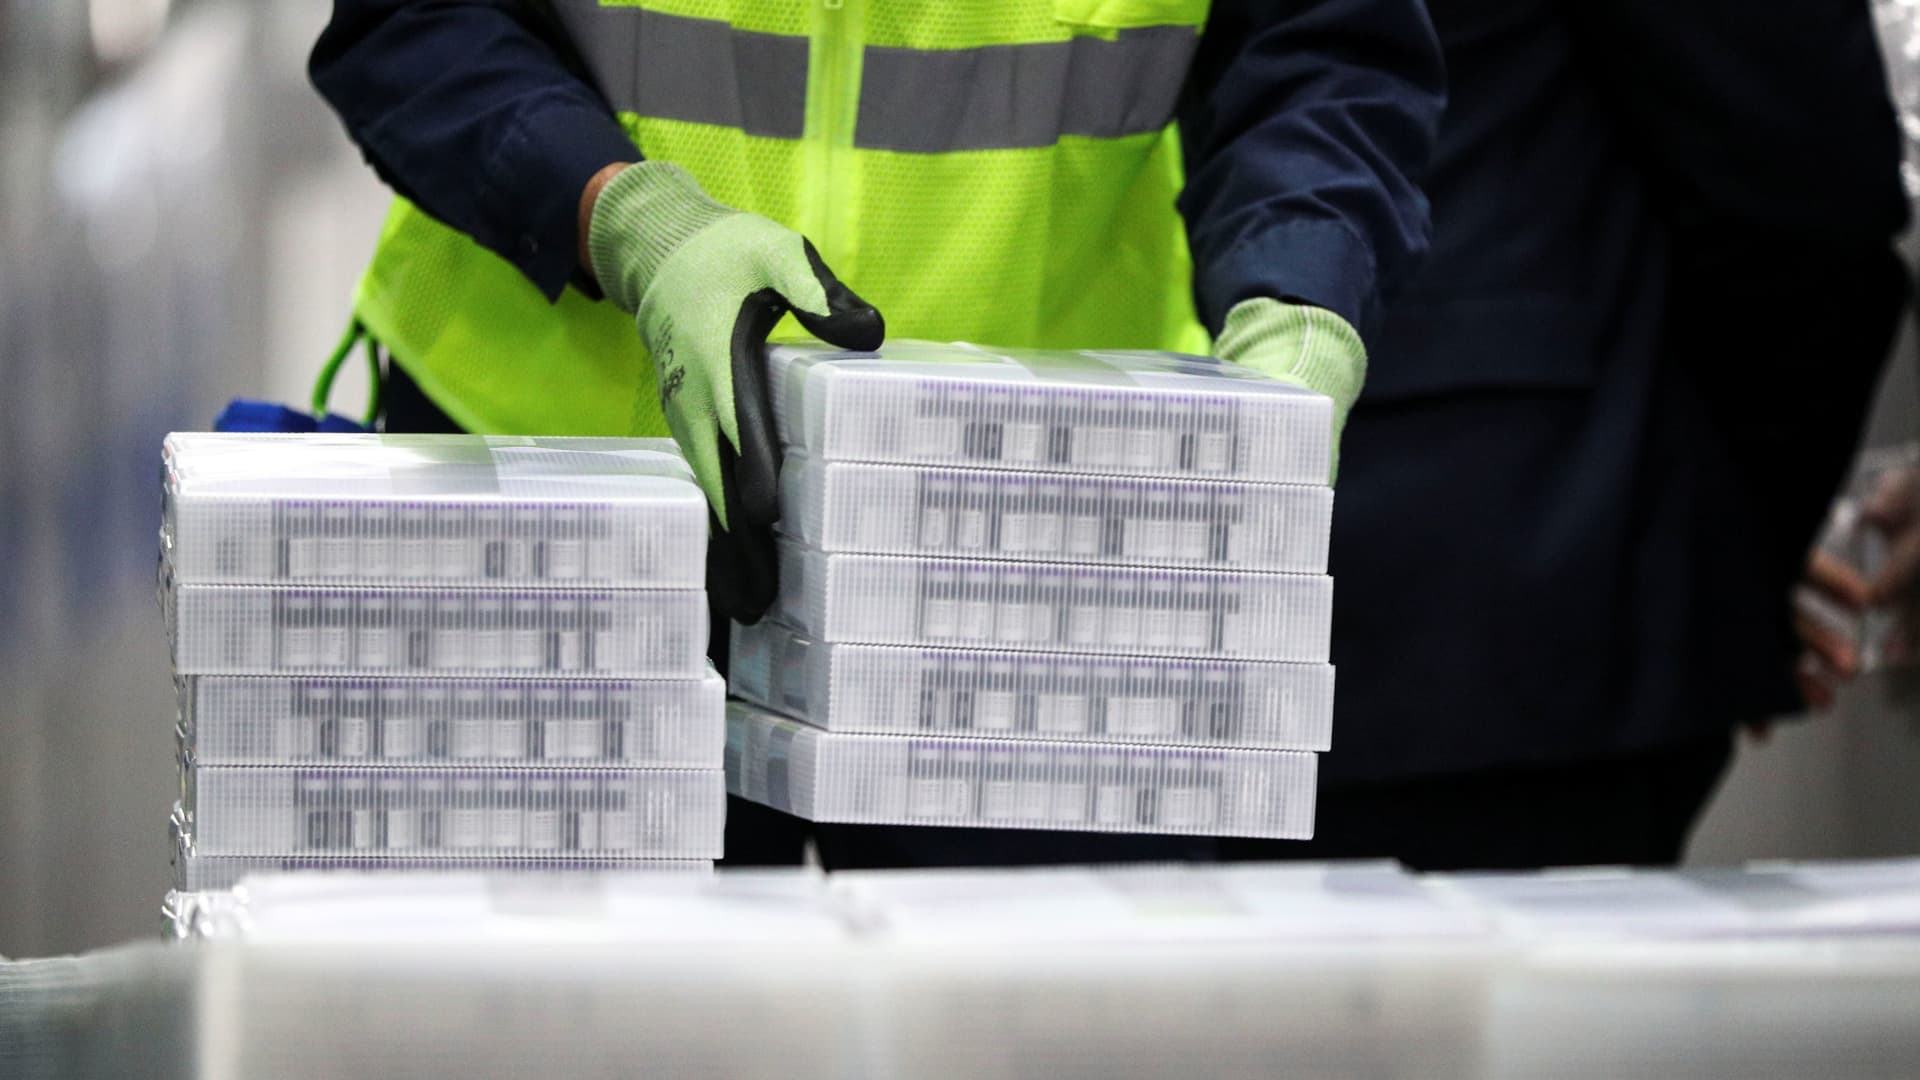 Pfizer employees handle containers of vaccine as U.S. President Joe Biden tours a Pfizer manufacturing plant producing the coronavirus disease (COVID-19) vaccine in Kalamazoo, Michigan, U.S., February 19, 2021.